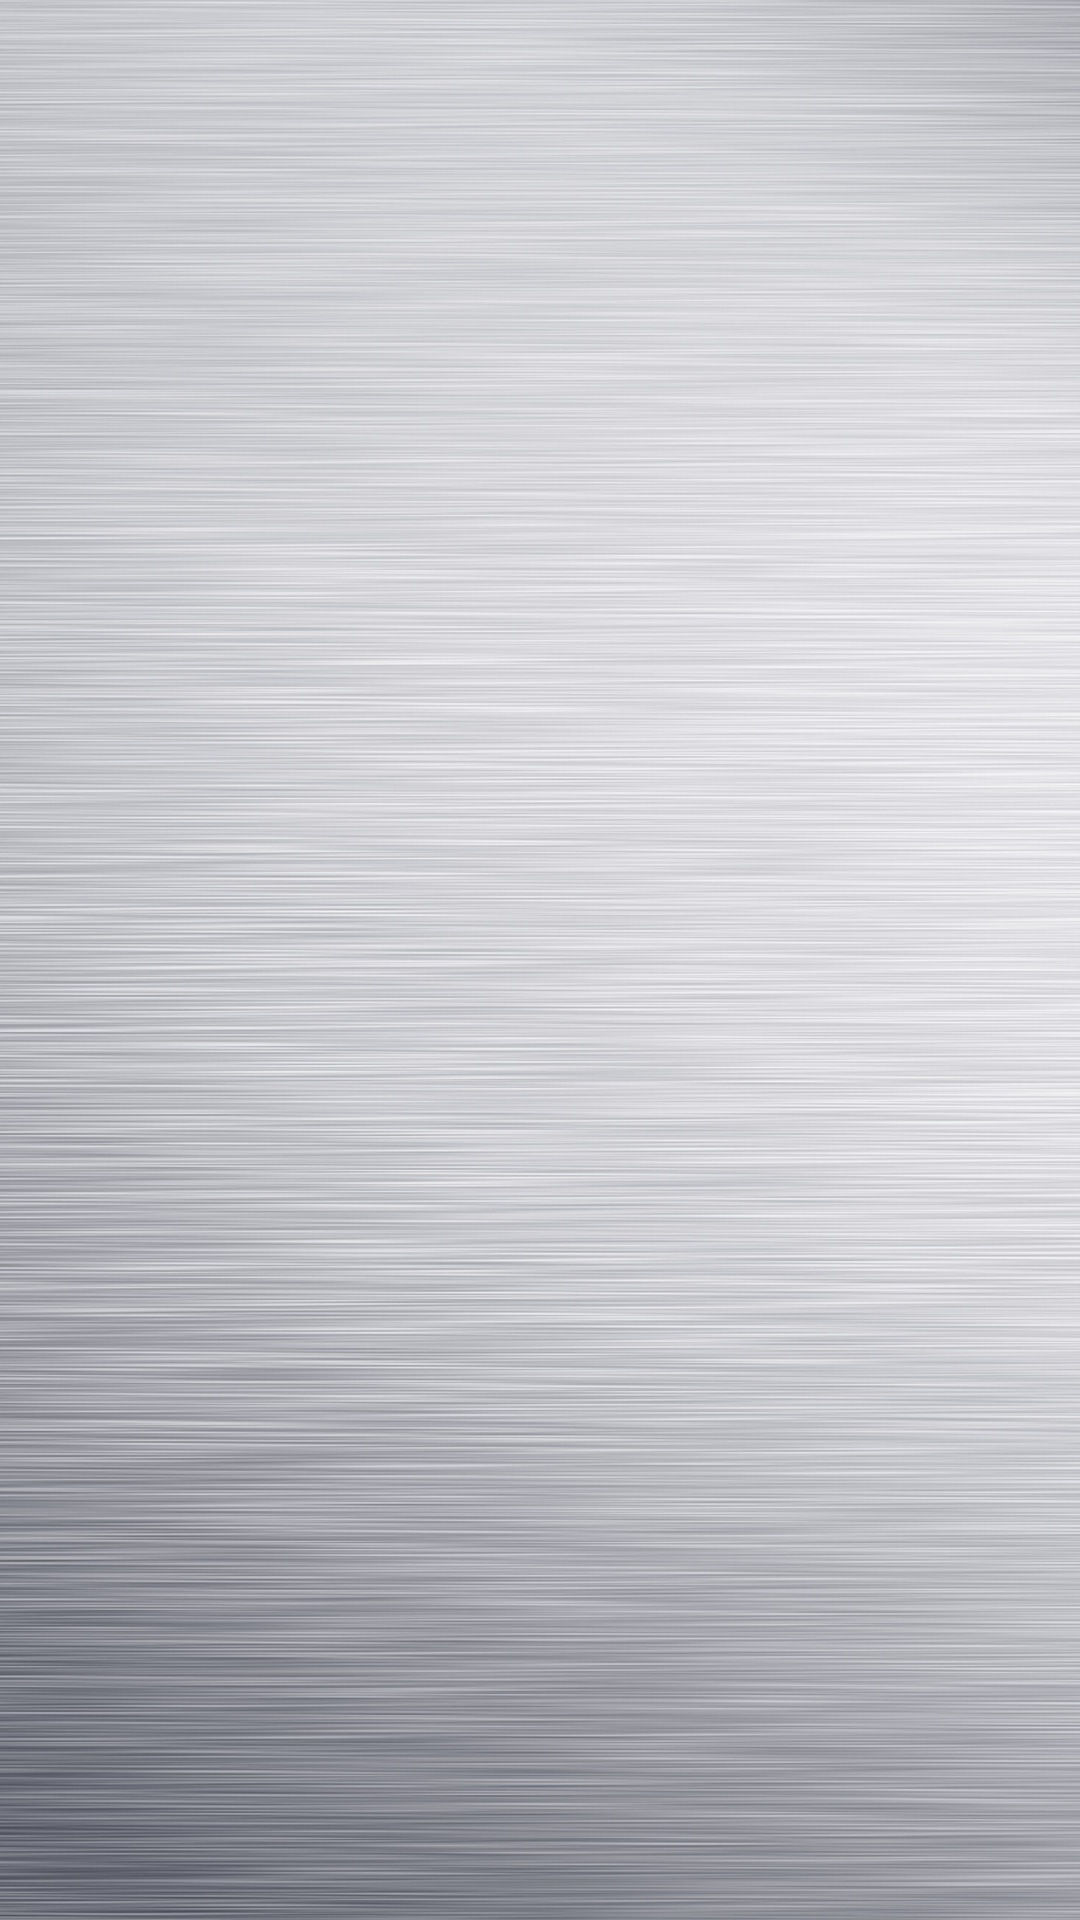 Horizontal Brushed Metal Surface Android Wallpaper download 1080x1920